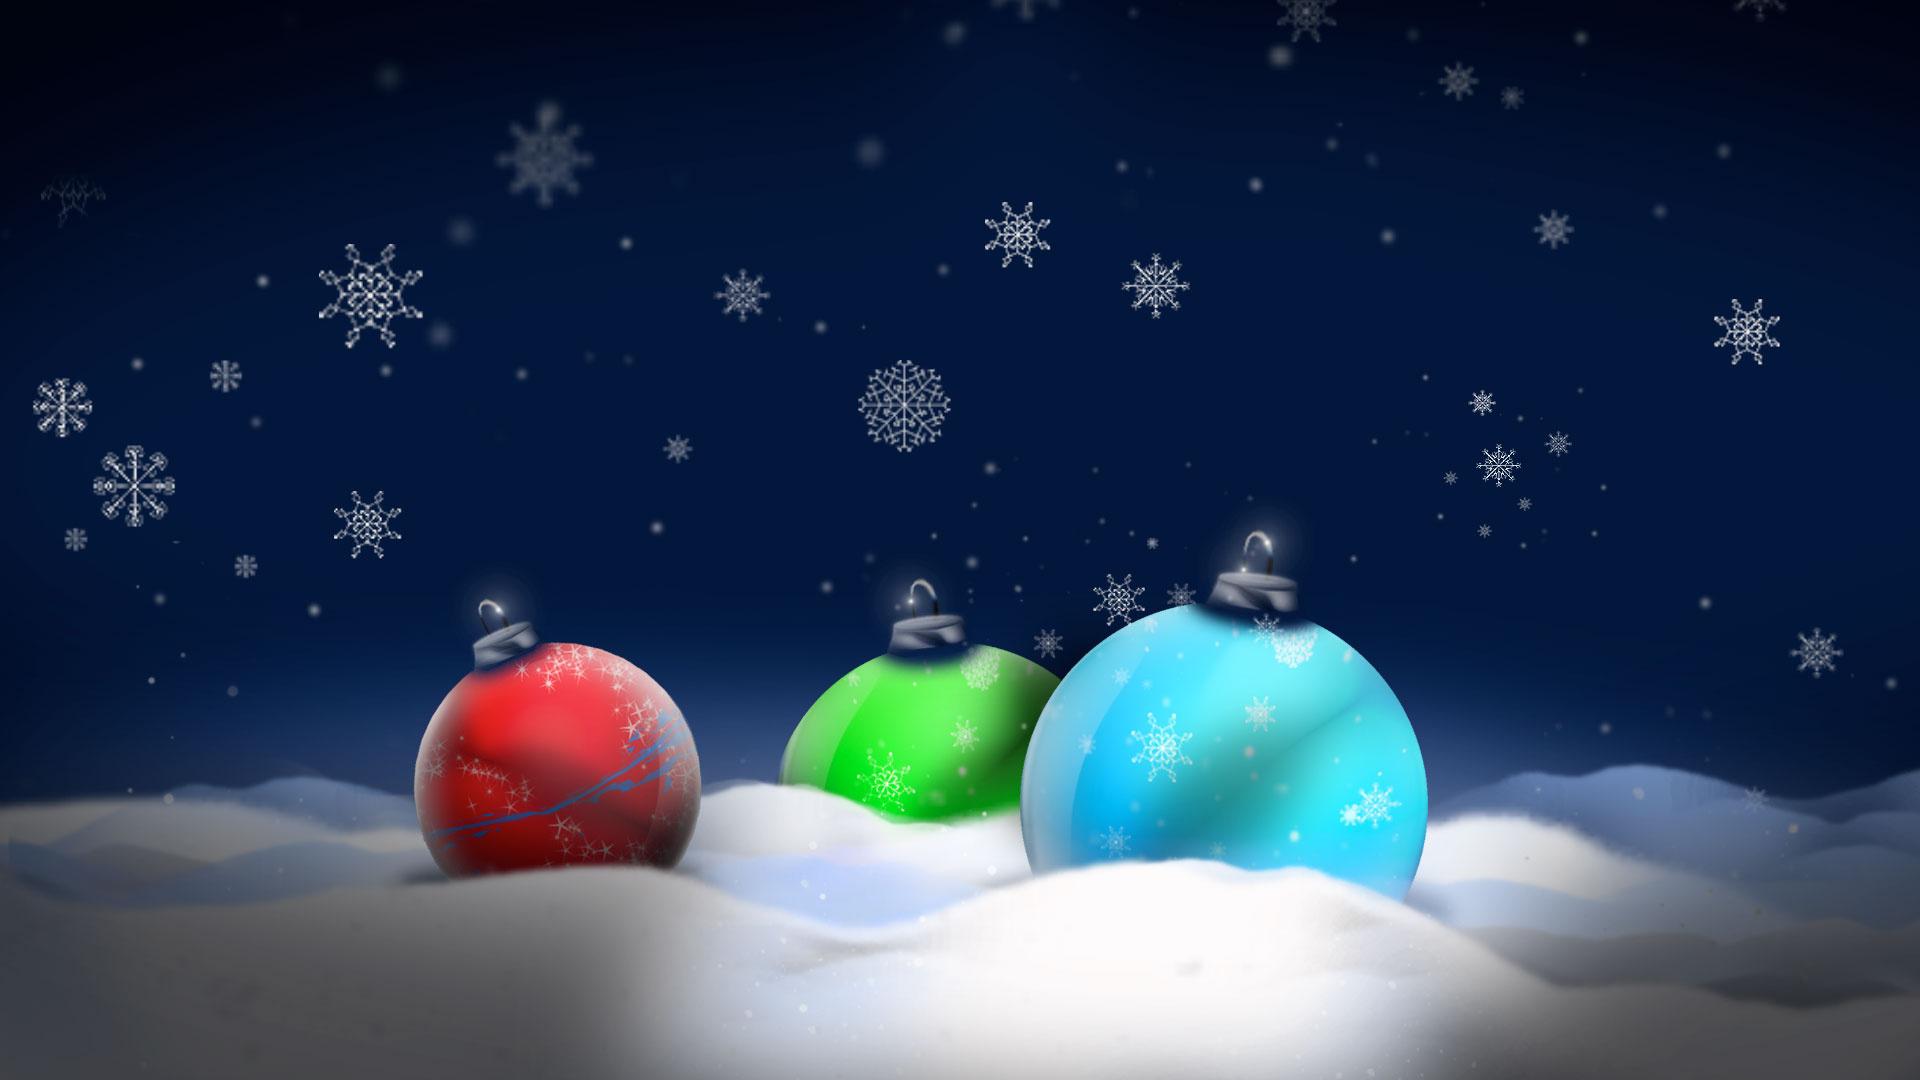 шарики, снег, снежинки